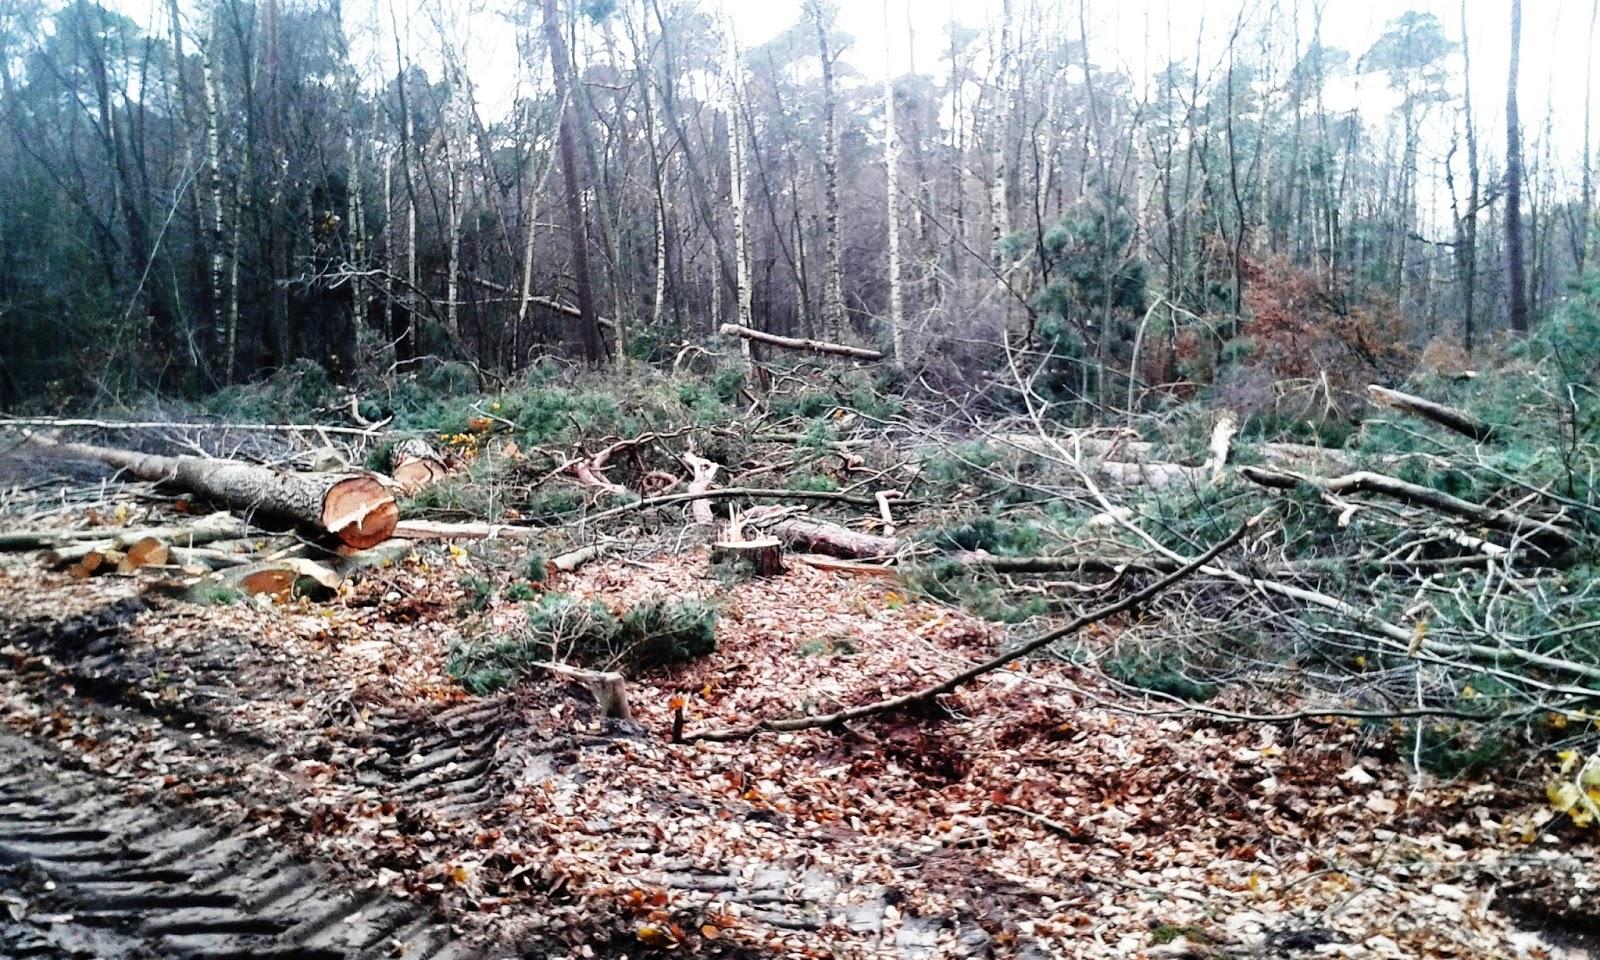 Help massale bomenkap voorkomen